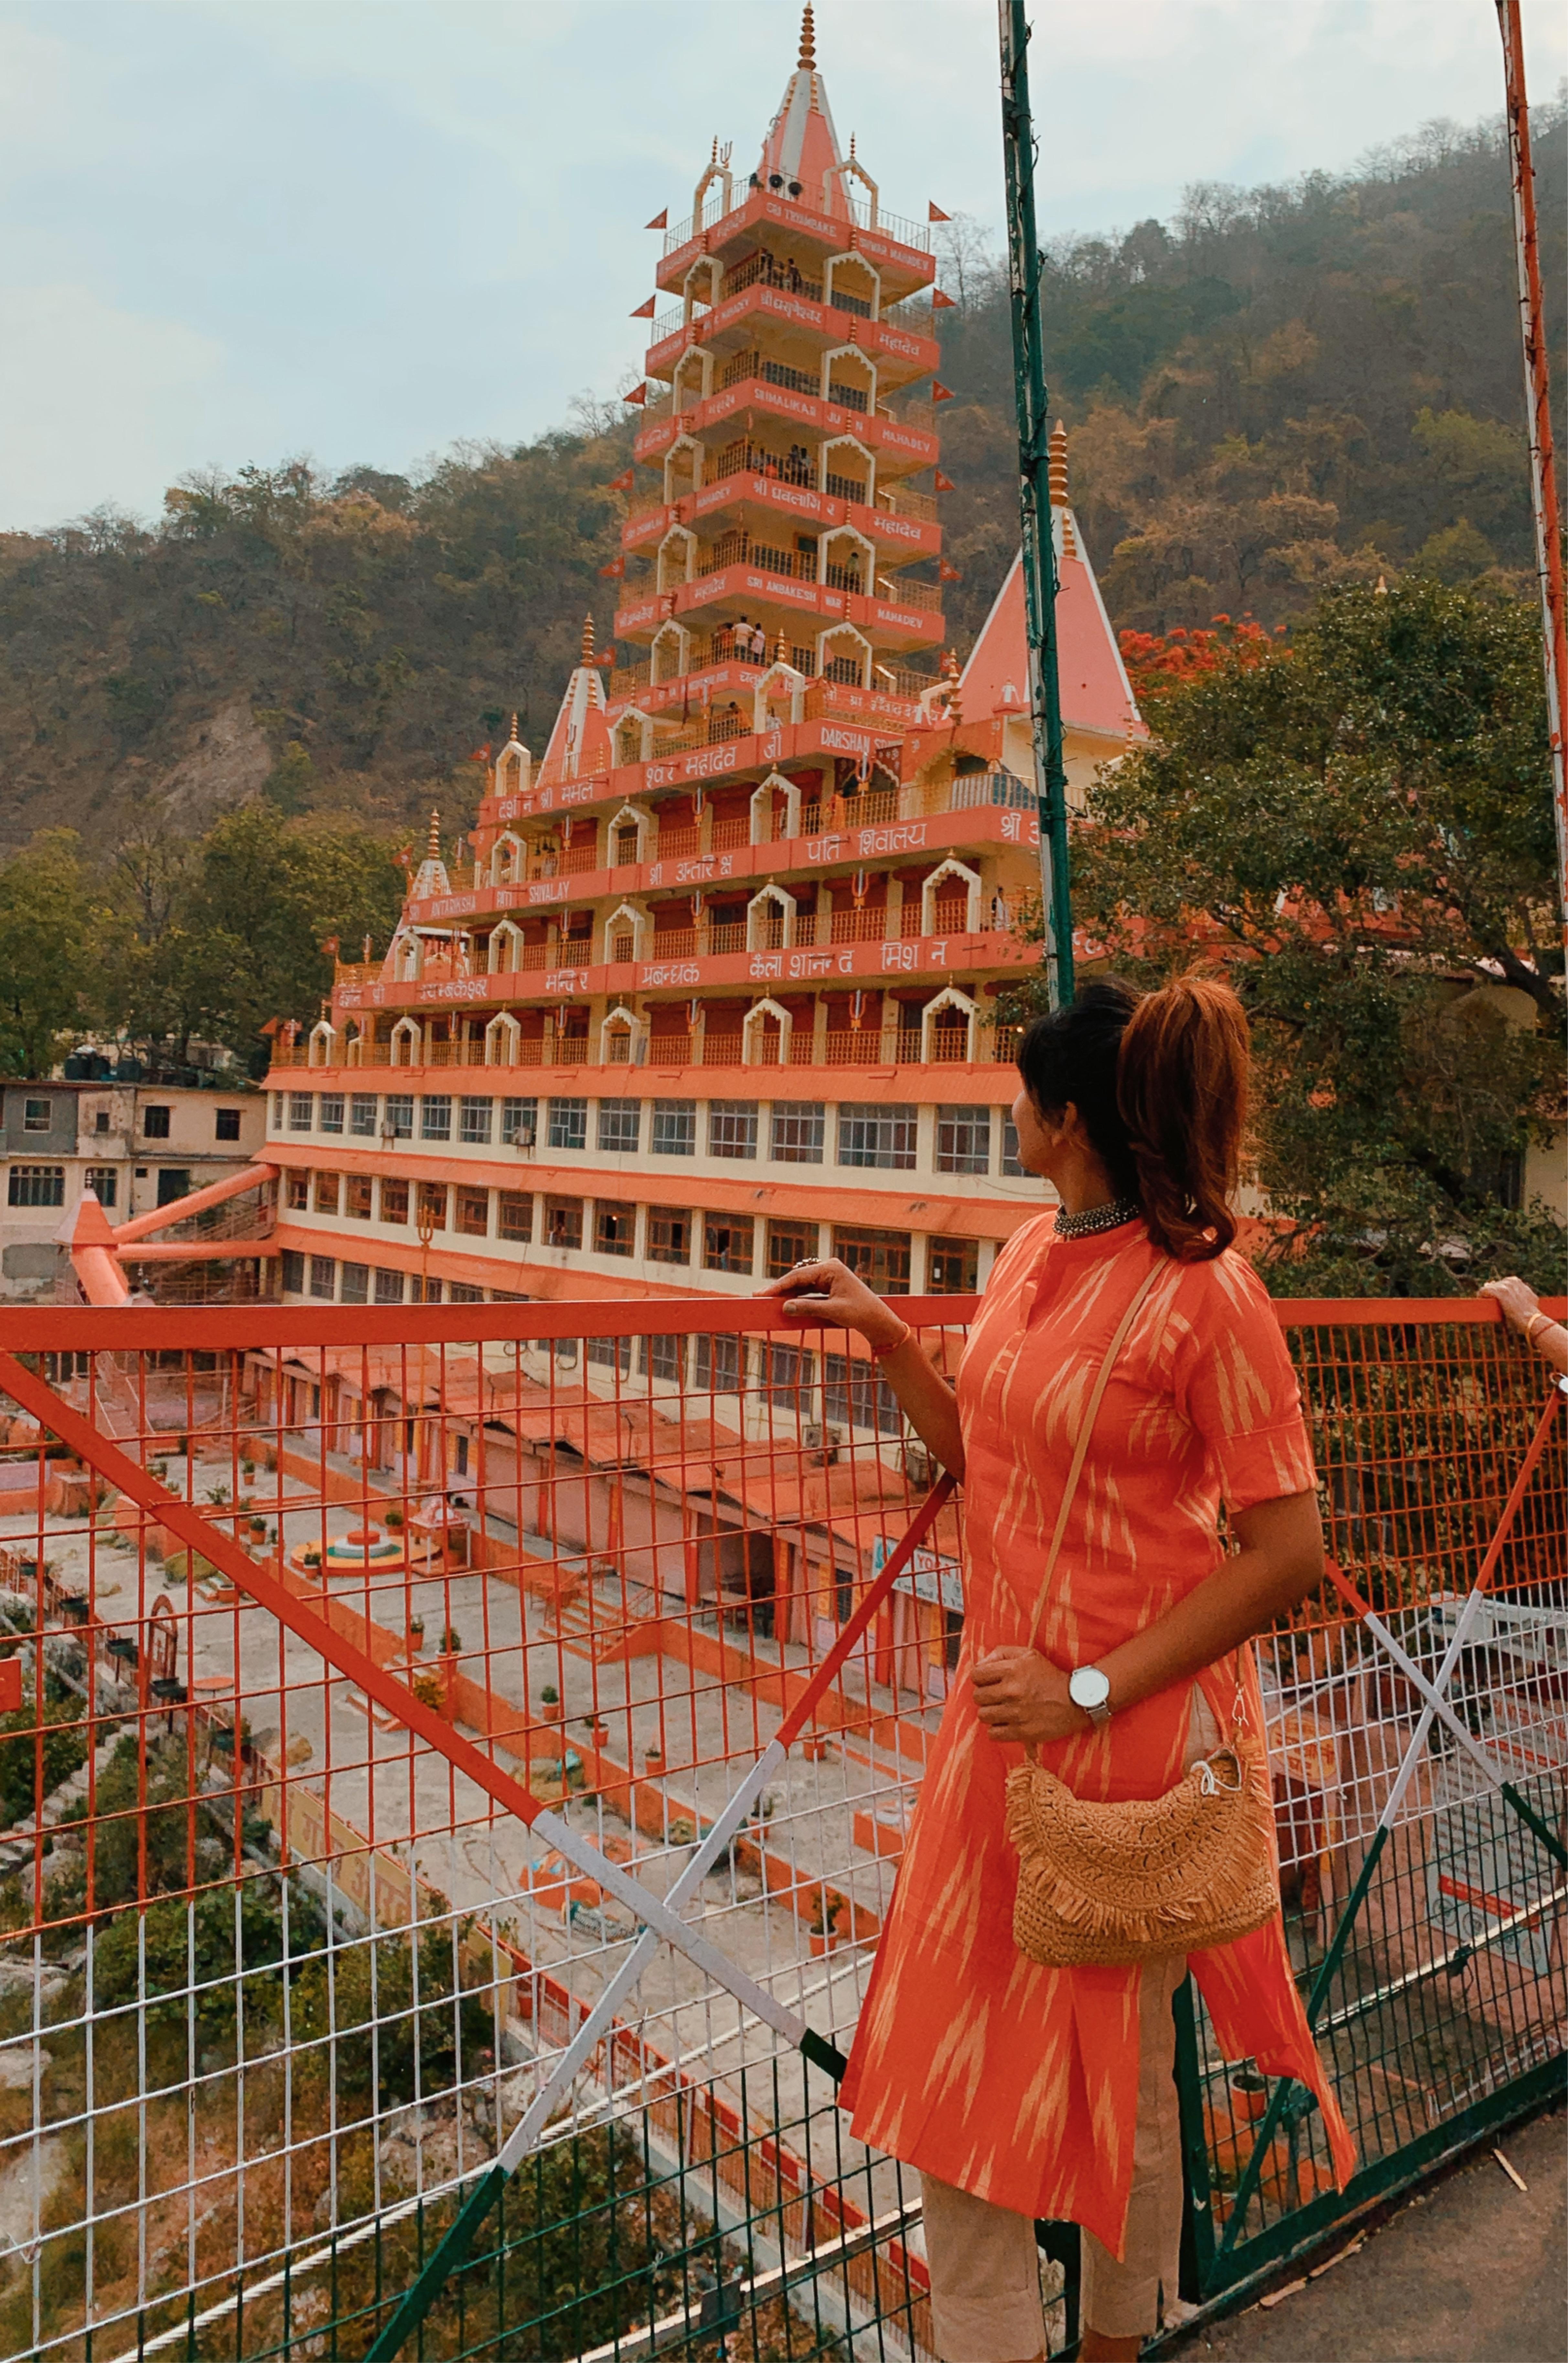 Rishikesh! 🙏🏼  #nomadgirls #journeysofgirls #damestravel #colorsofindia #incredibleindia #natgeoindia #wandertheworld #femmetravel #womentravel #travelrealindia #beautifulindia #exploreindia #indiaig #visitindia #voyaged #indiatourism #indiapictures #Delhiyoutuber #bangaloreblogger#bangaloreyoutuber #bangaloreinfluencer #uttarakhandtourism #mumbaibloggers#delhibloggers#indiangirlstravel #bangaloretravellers #uttarakhand_travel_diaries #delhibloggers #bangaloretravelblogger #rishikesh